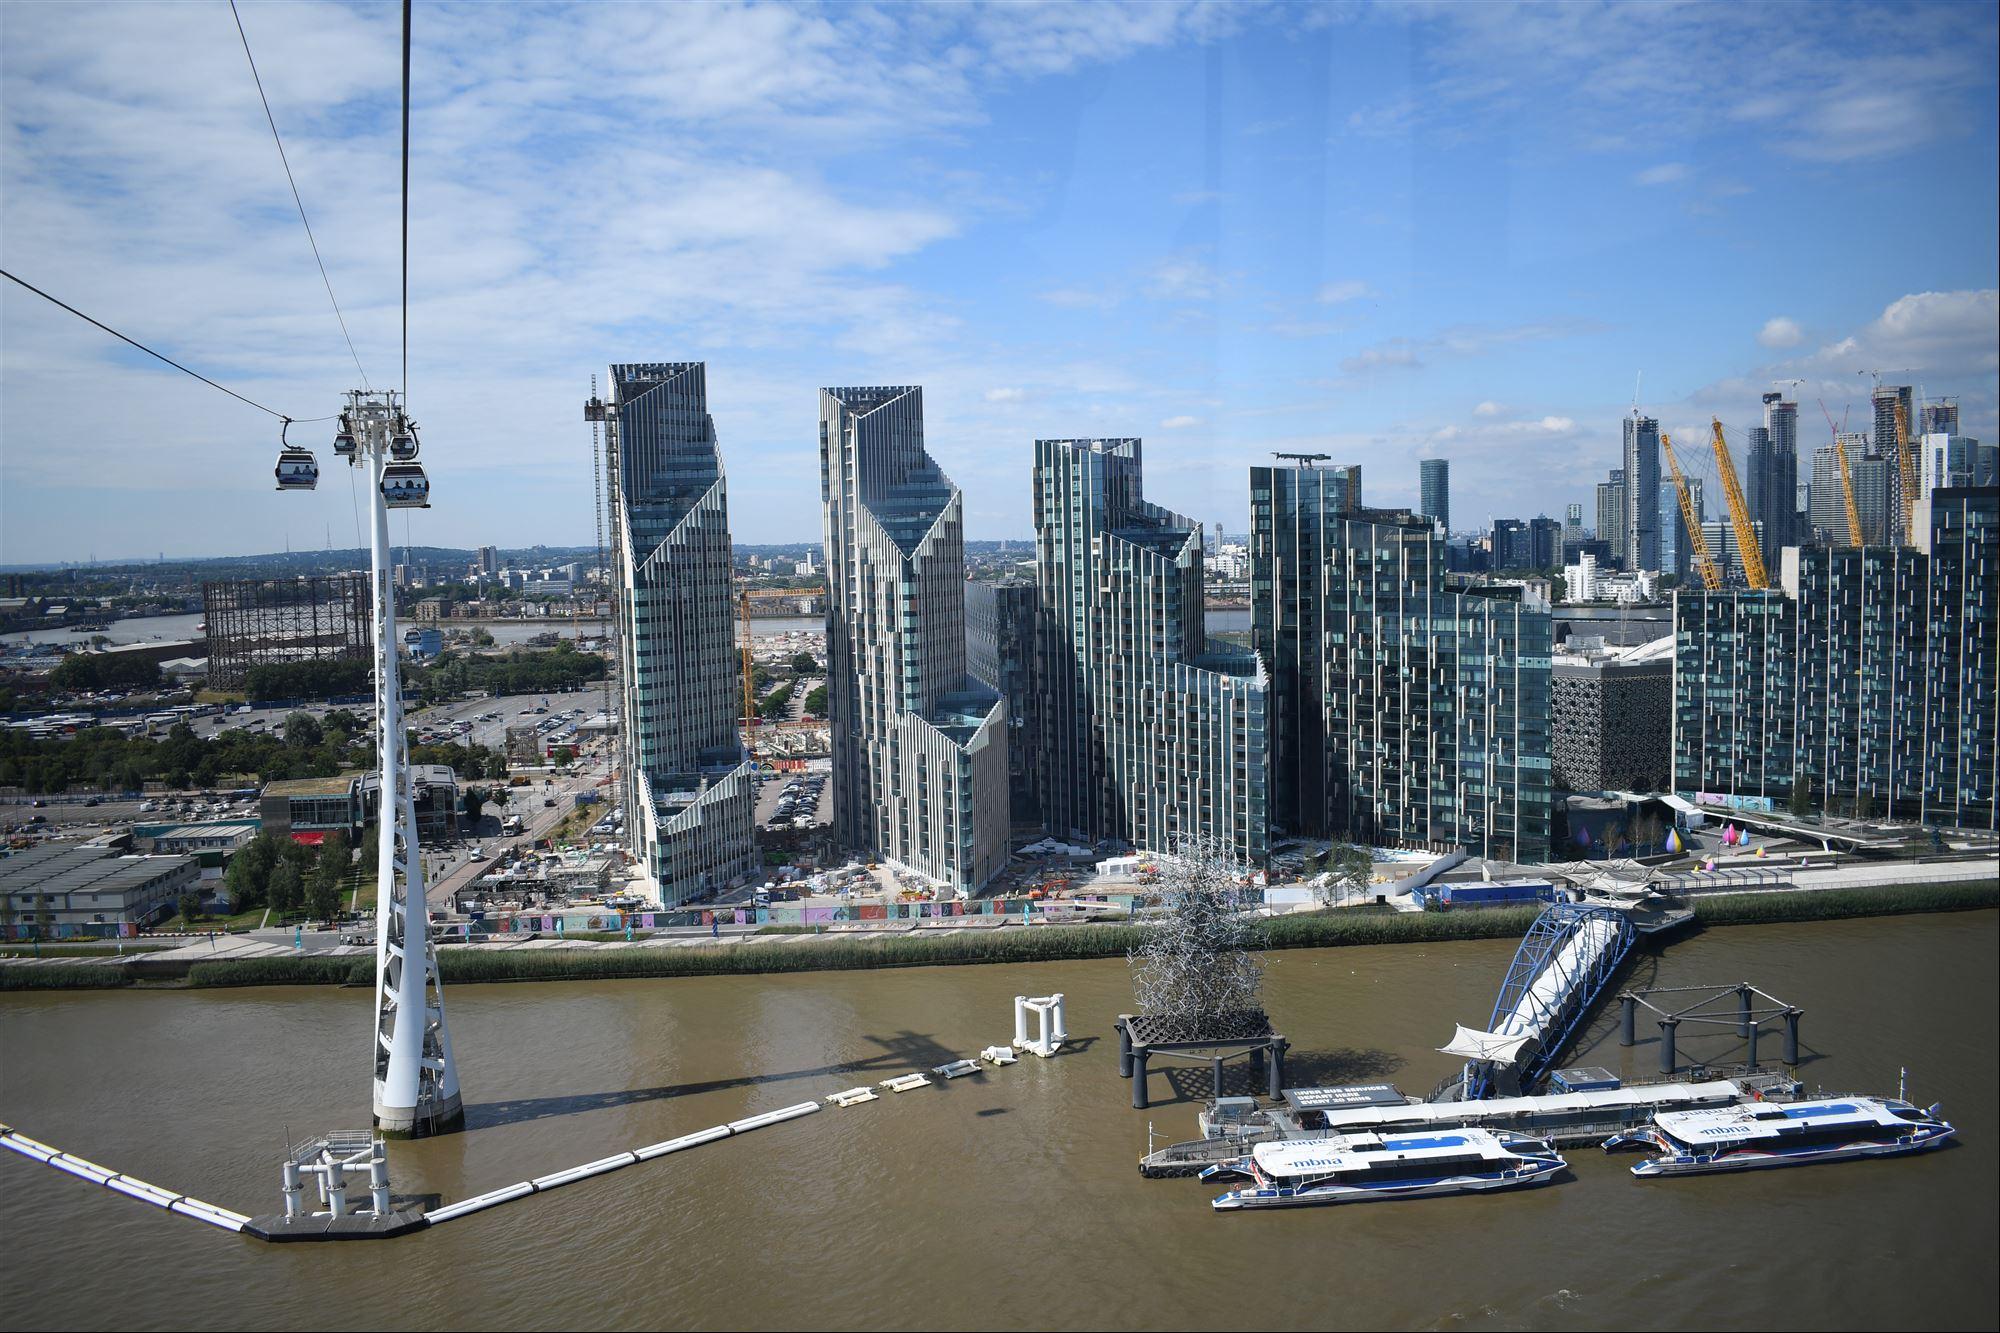 006 London Day 2